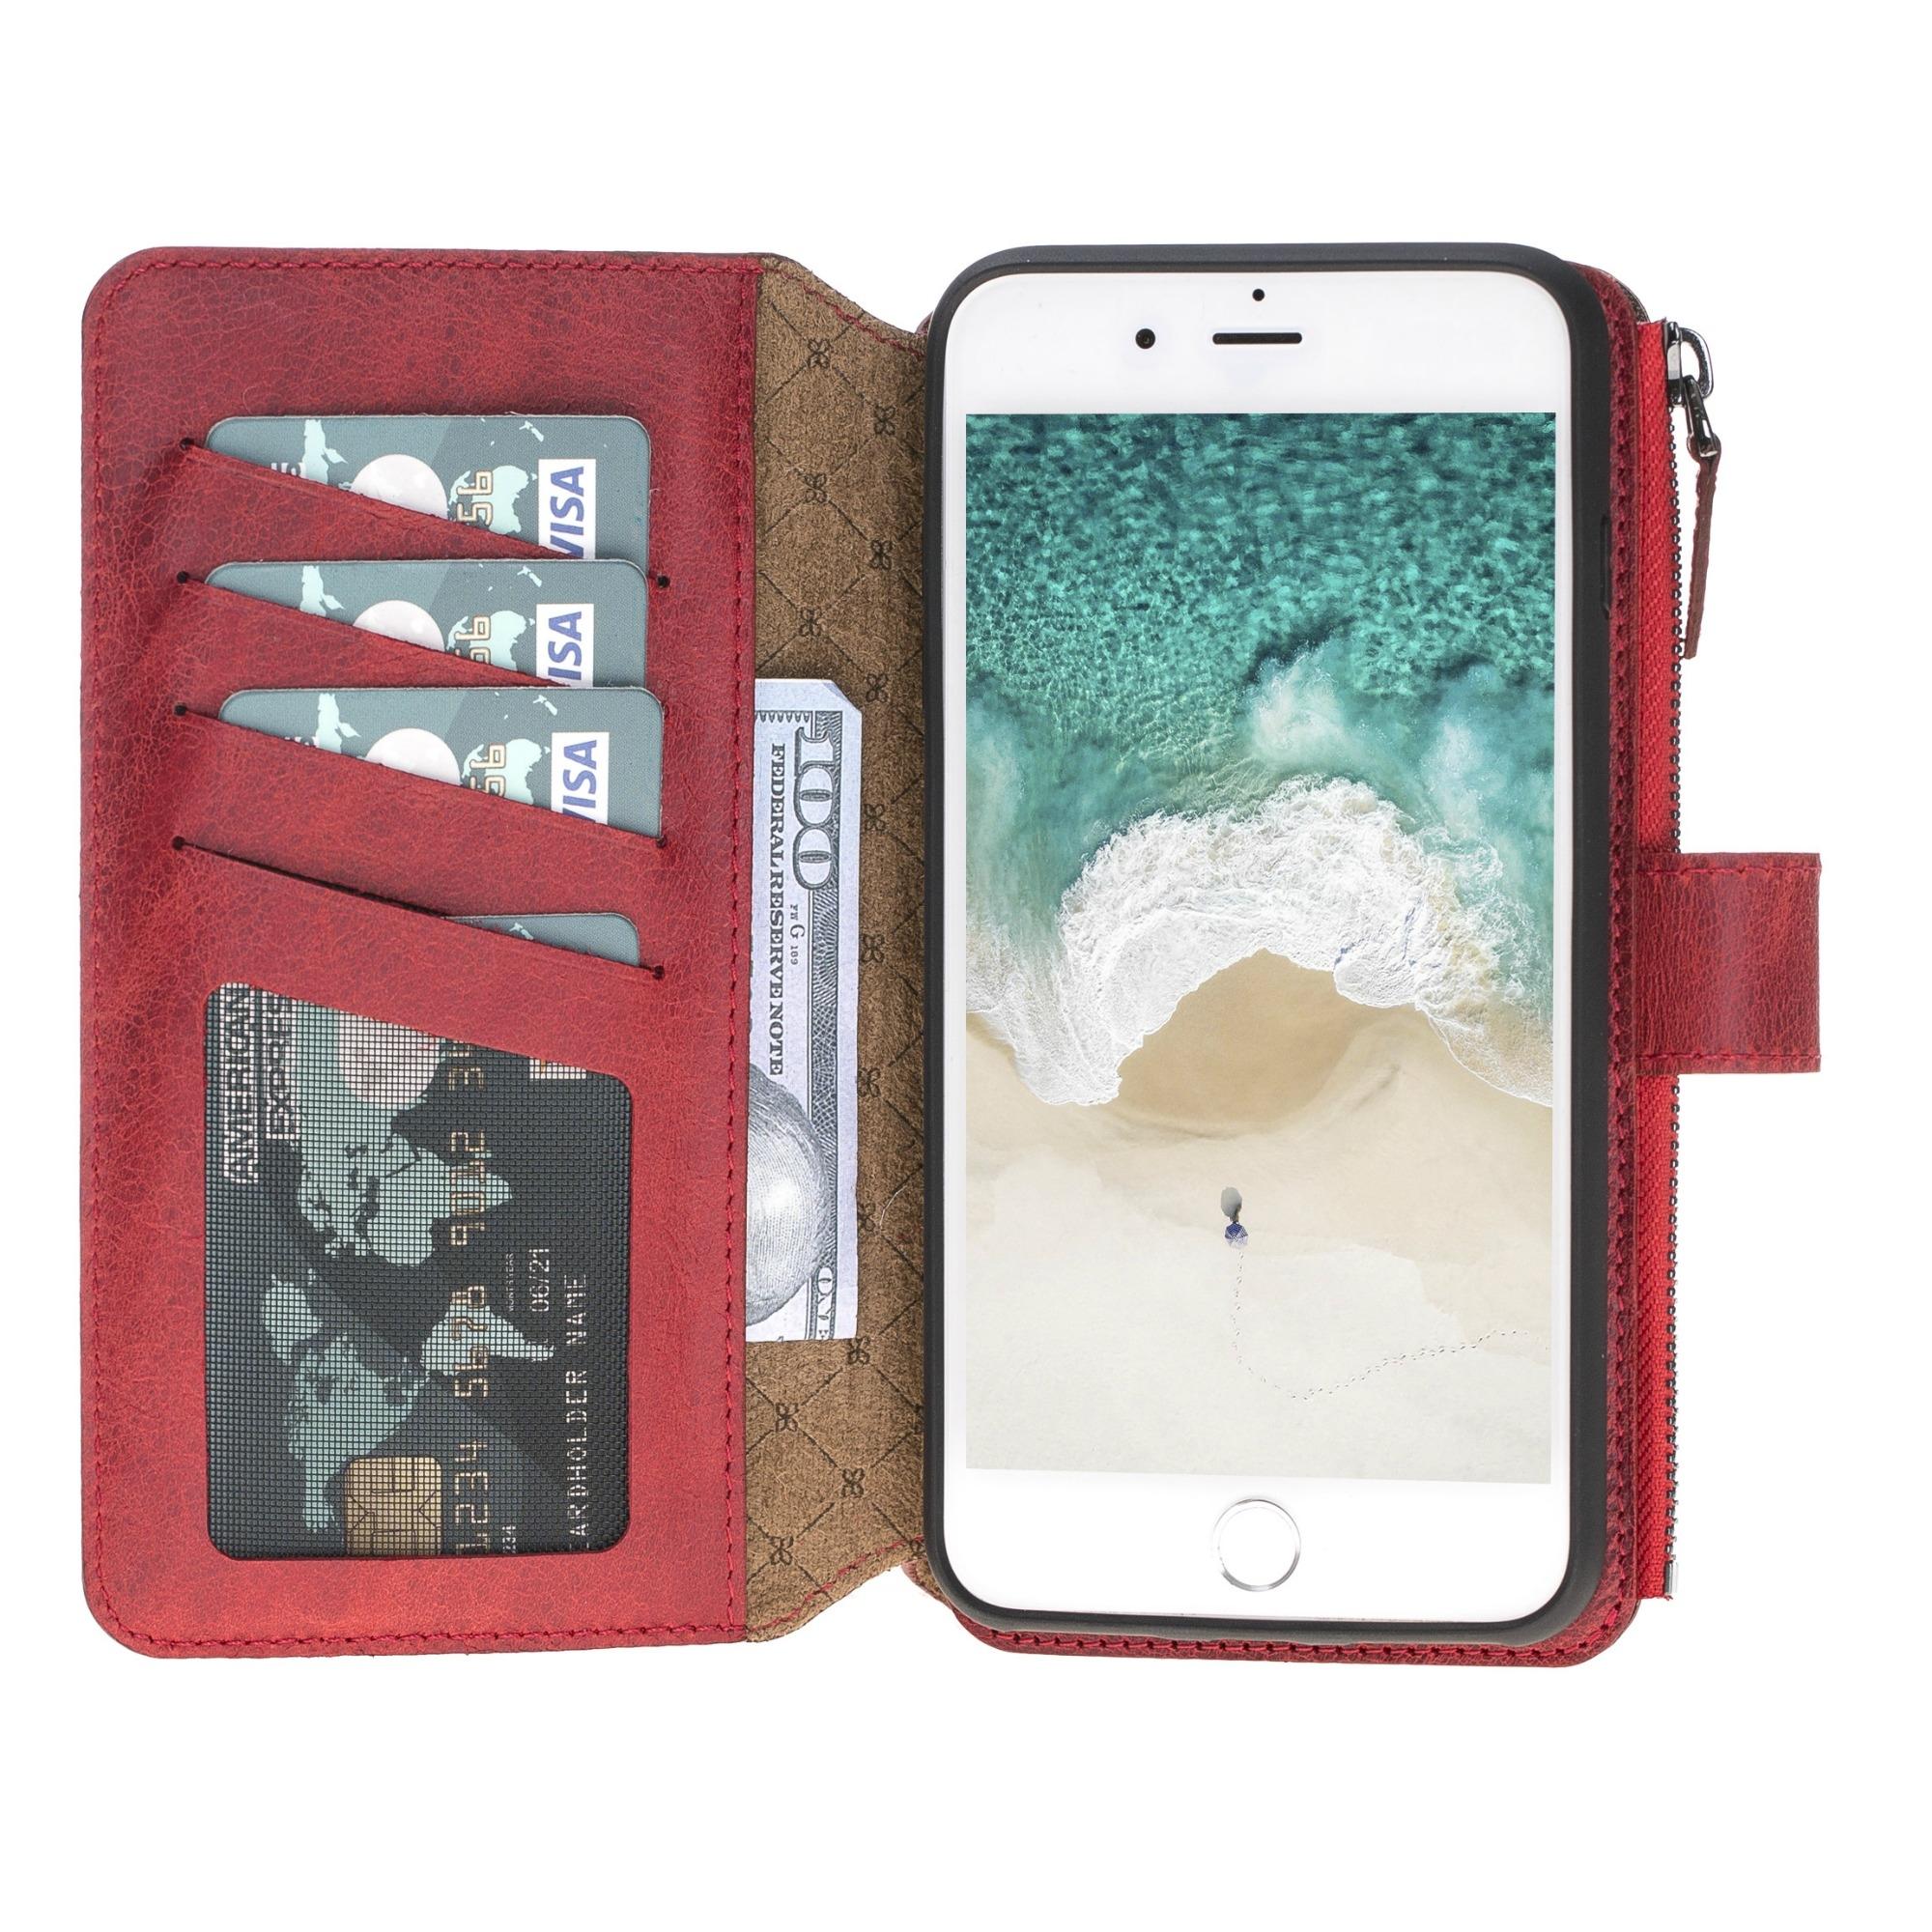 Чехол ZipMagic Wallet Bouletta Бордовый TN7 для Iphone 7/8 Plus